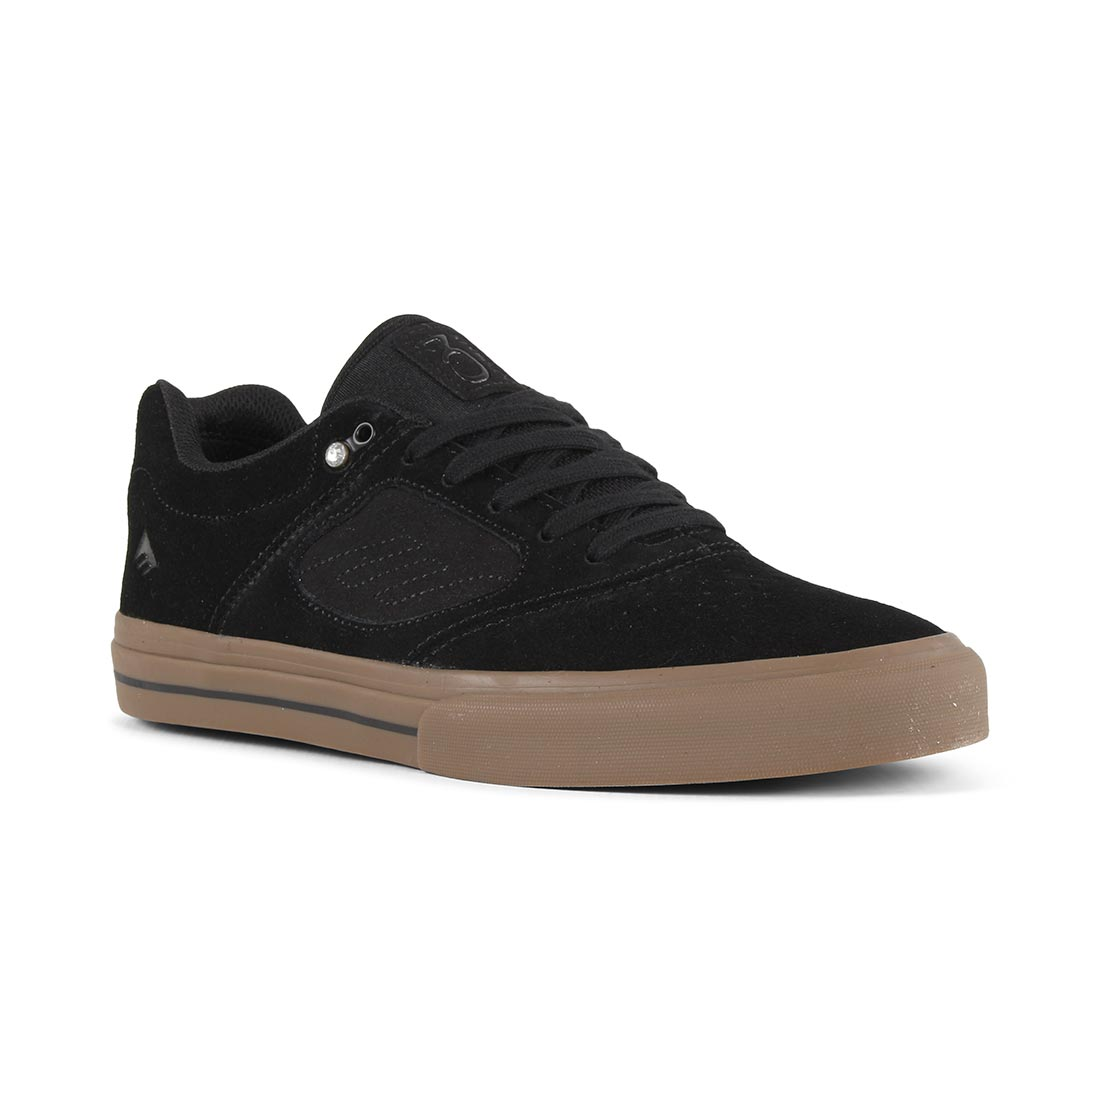 Emerica Reynolds 3 G6 Vulc Mens Skate Shoes Black/Black